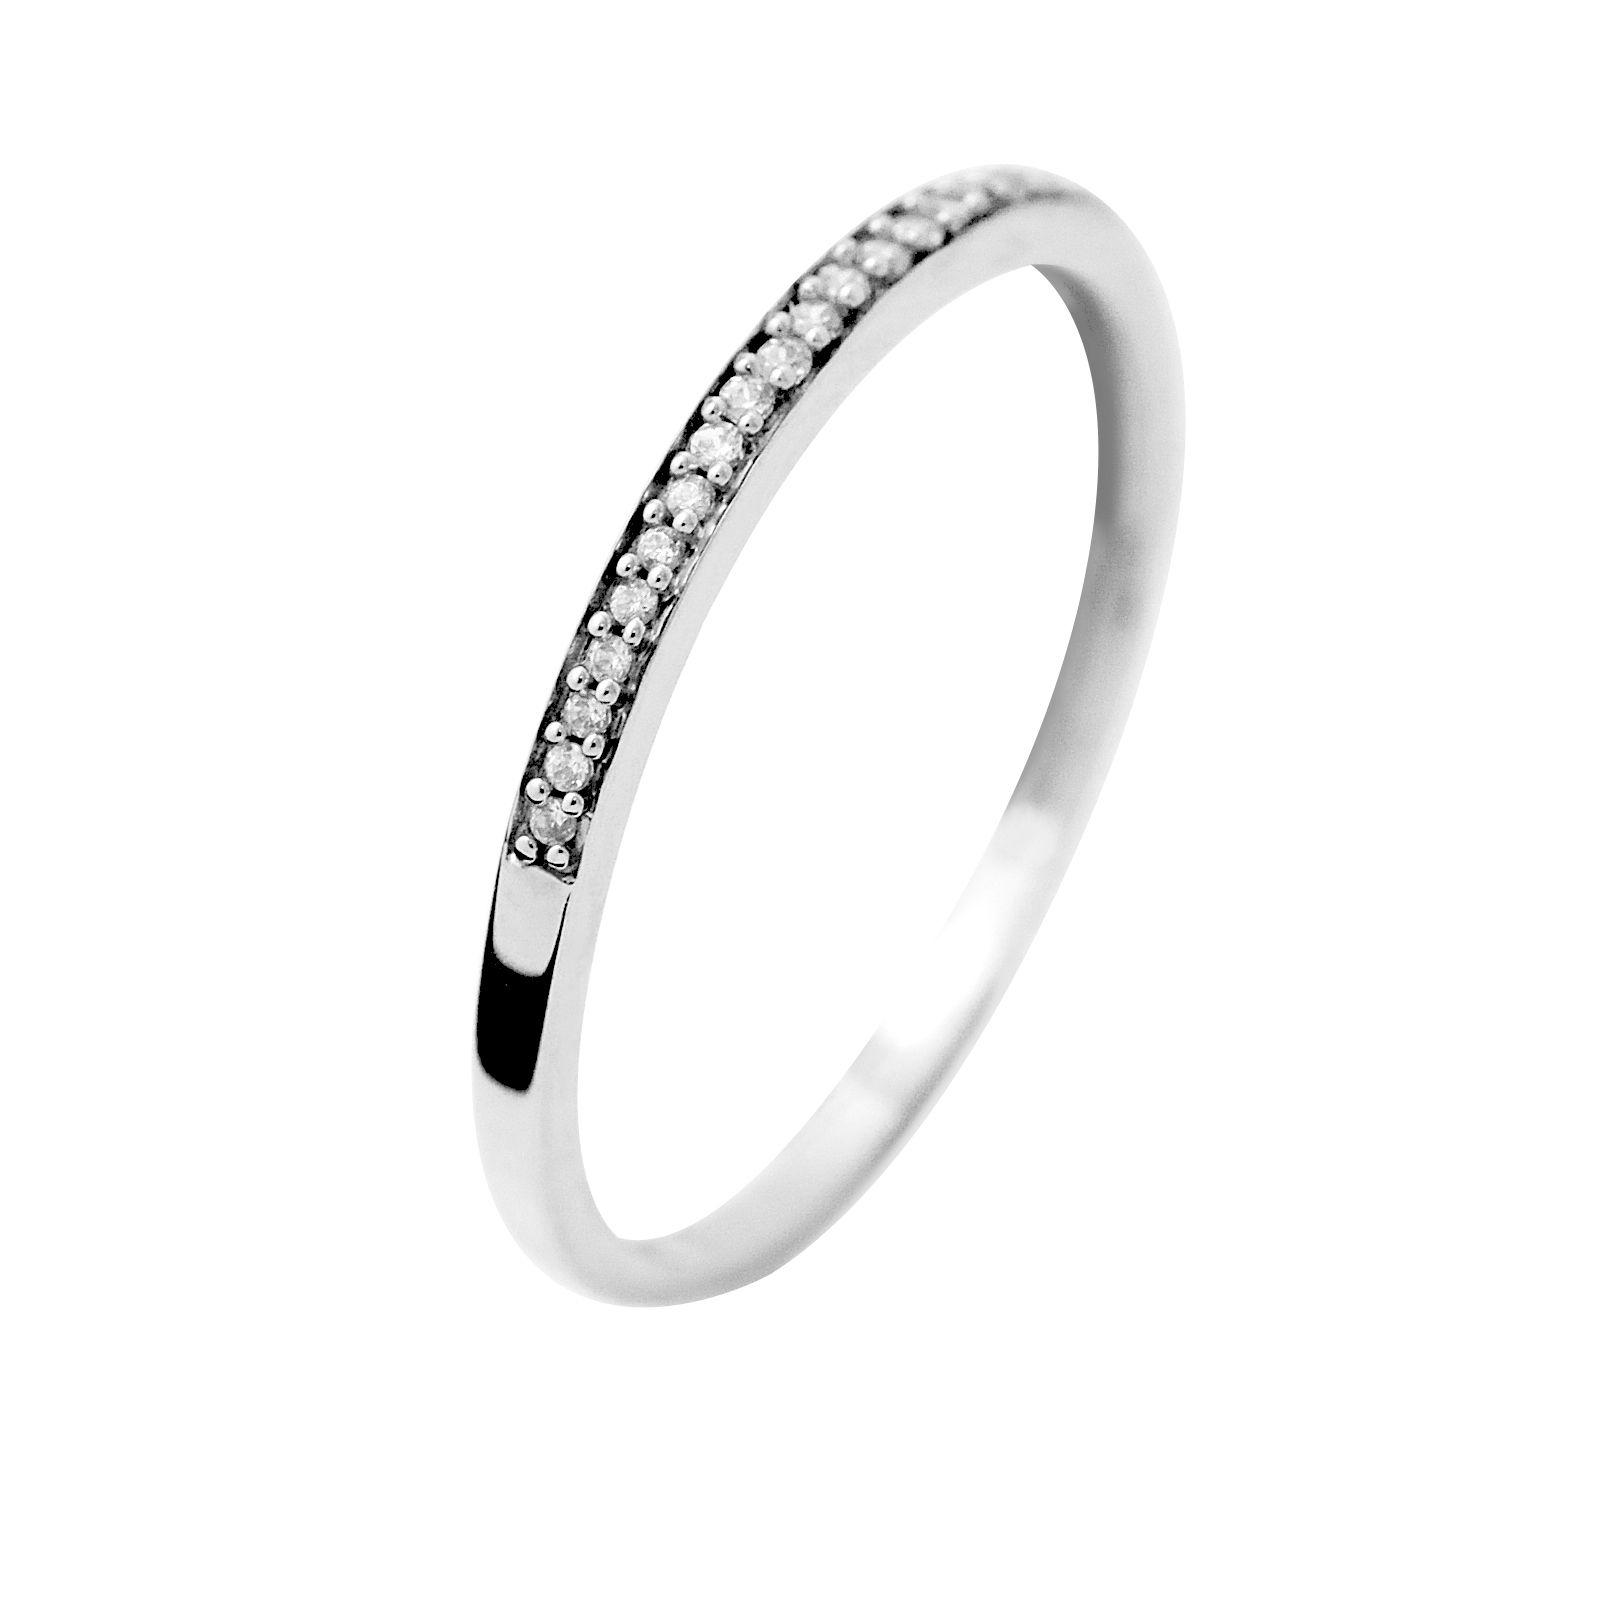 DIADEMA - Ring - Prestige Jewelery - Diamonds - White Gold